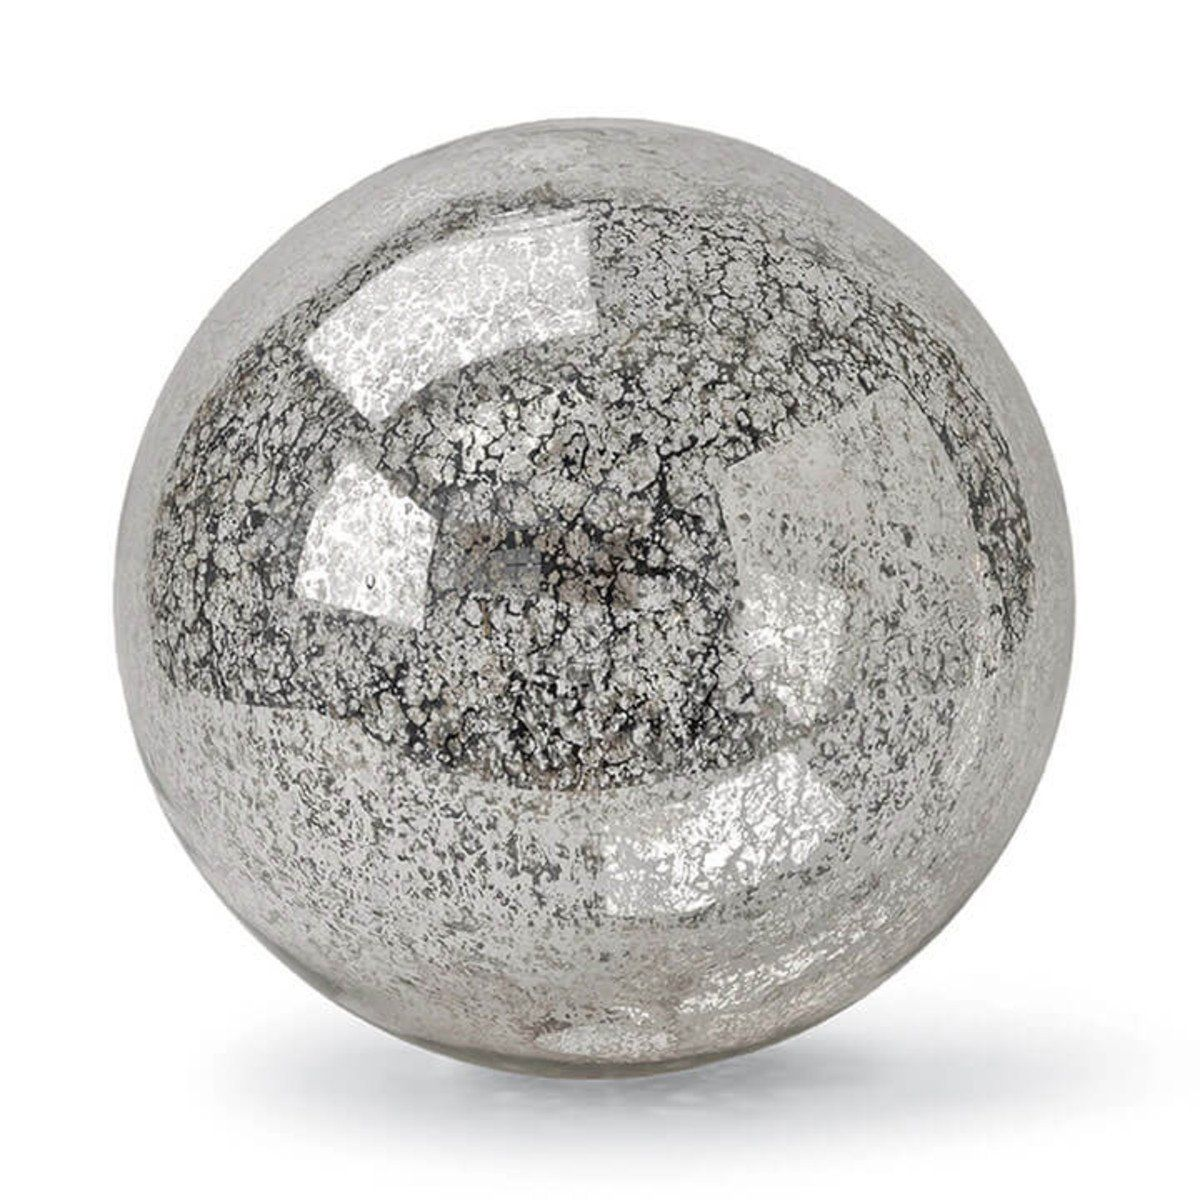 Mercury Glass Decorative Balls Regina Andrew Design Blown Mercury Glass Spheres  Mercury Glass